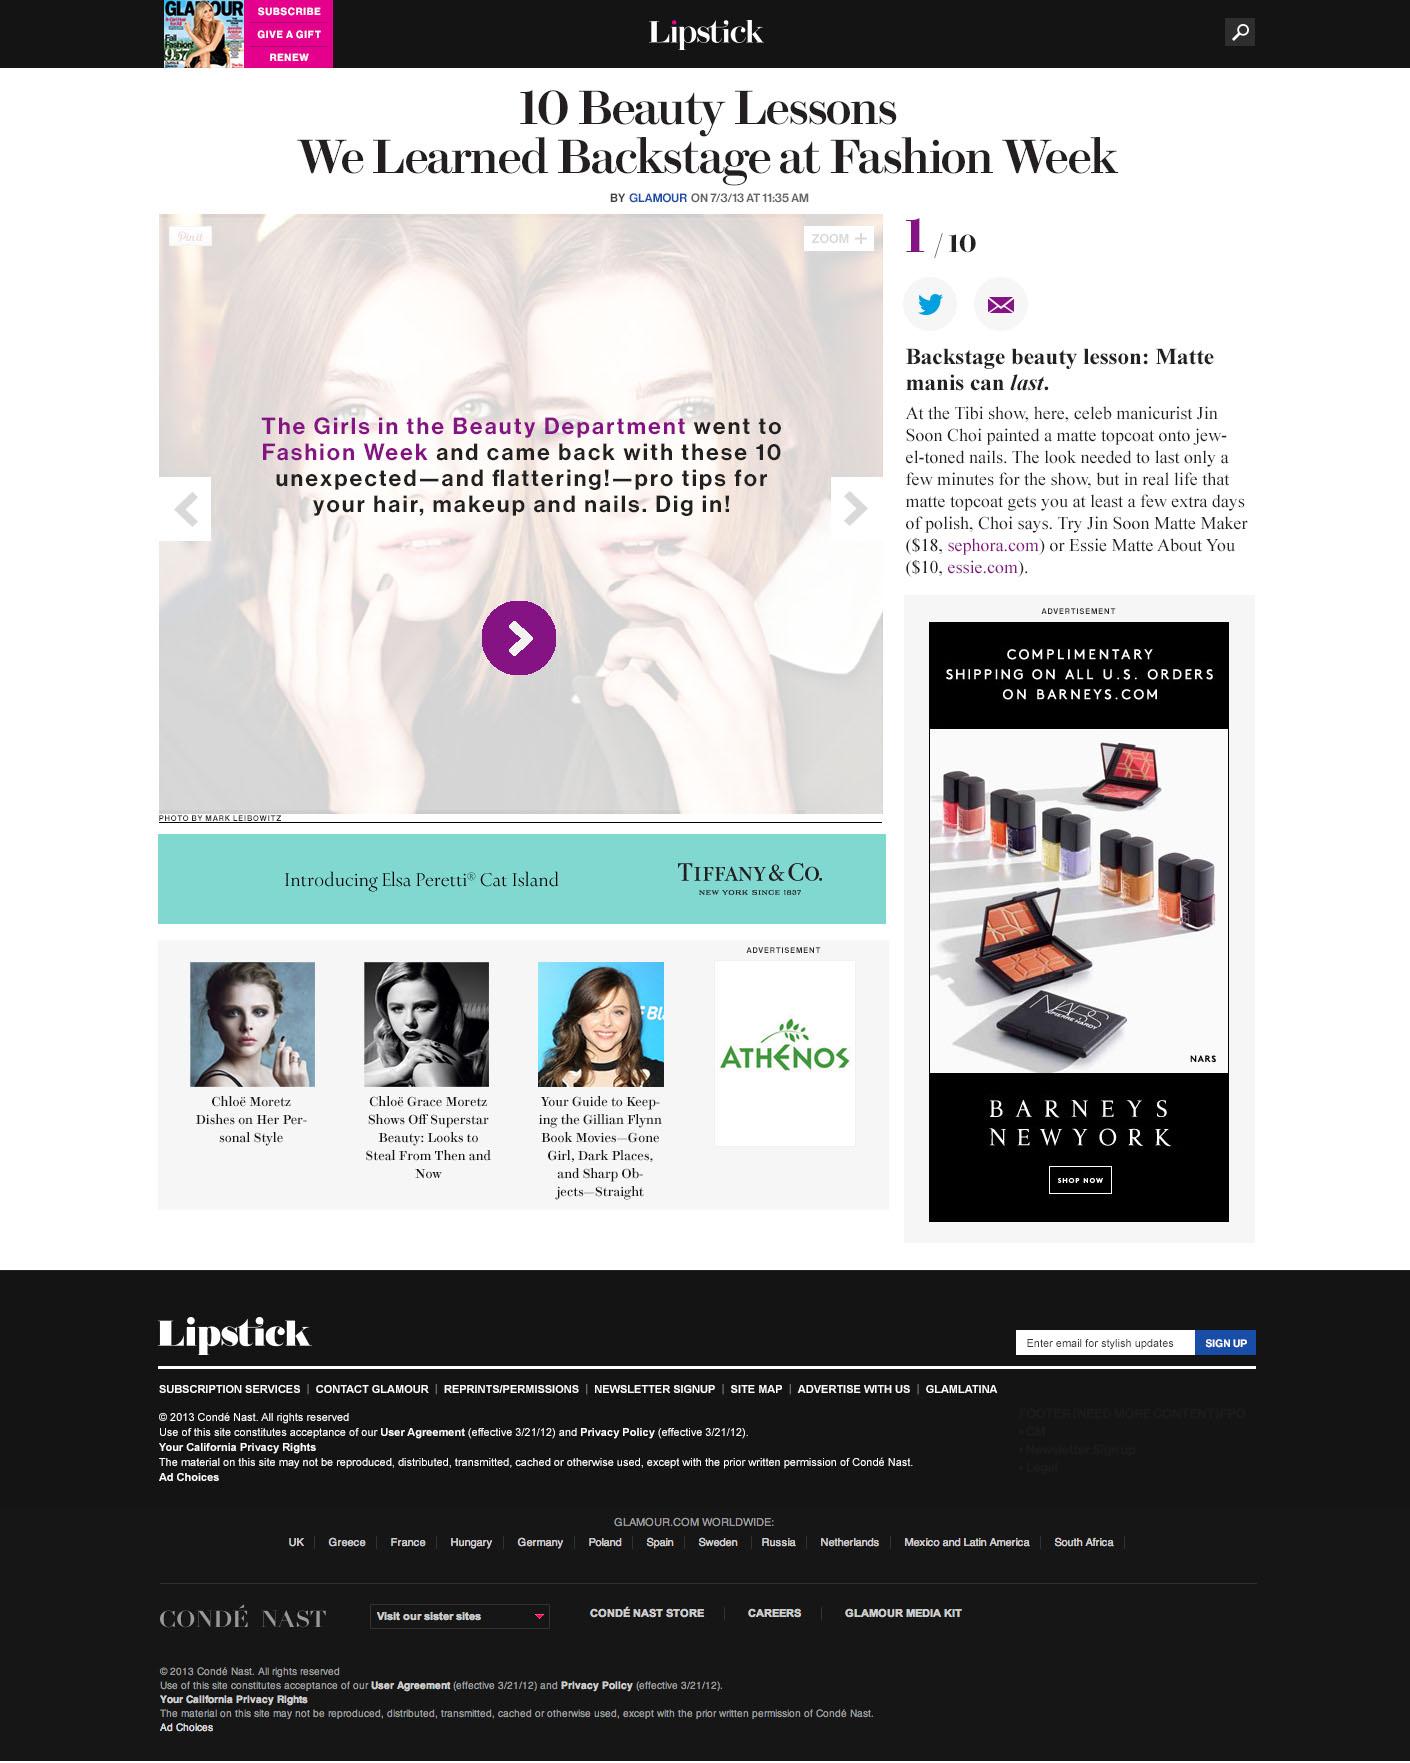 Lipstick_Slideshow1_0911.jpg